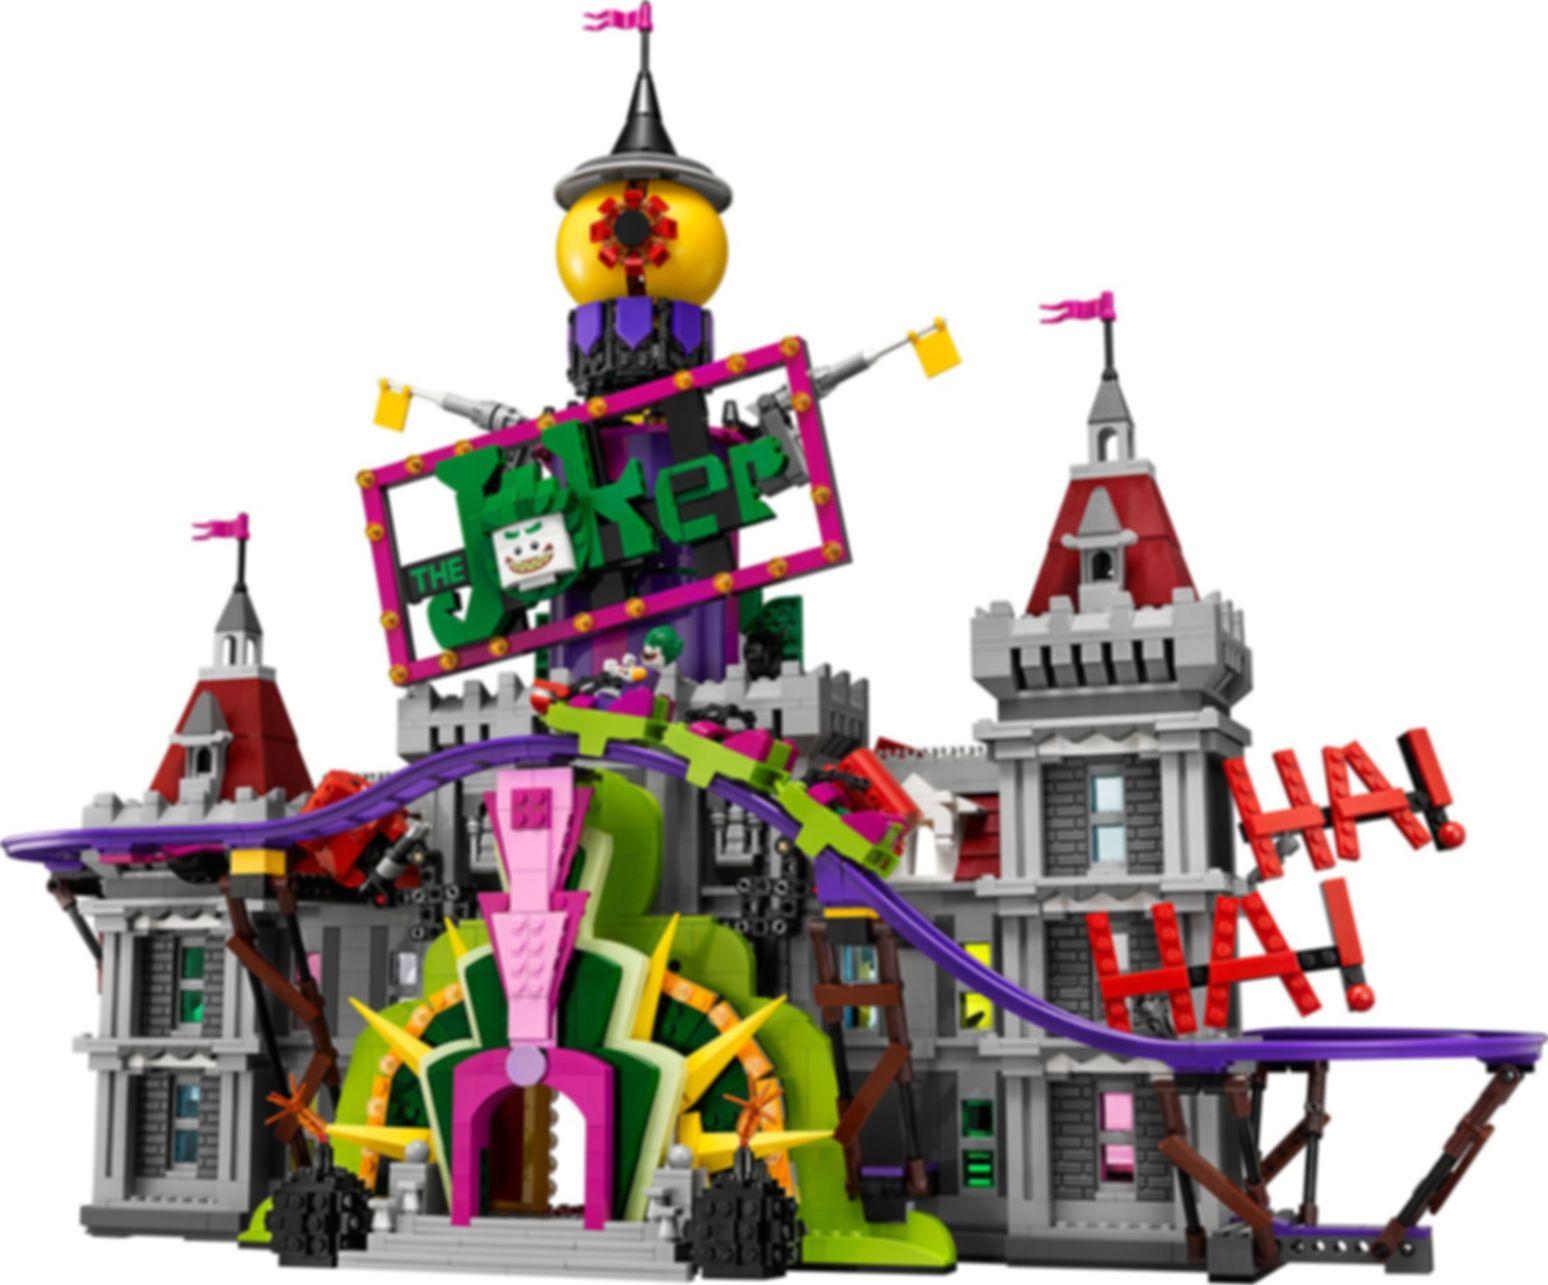 The Joker™ Manor components